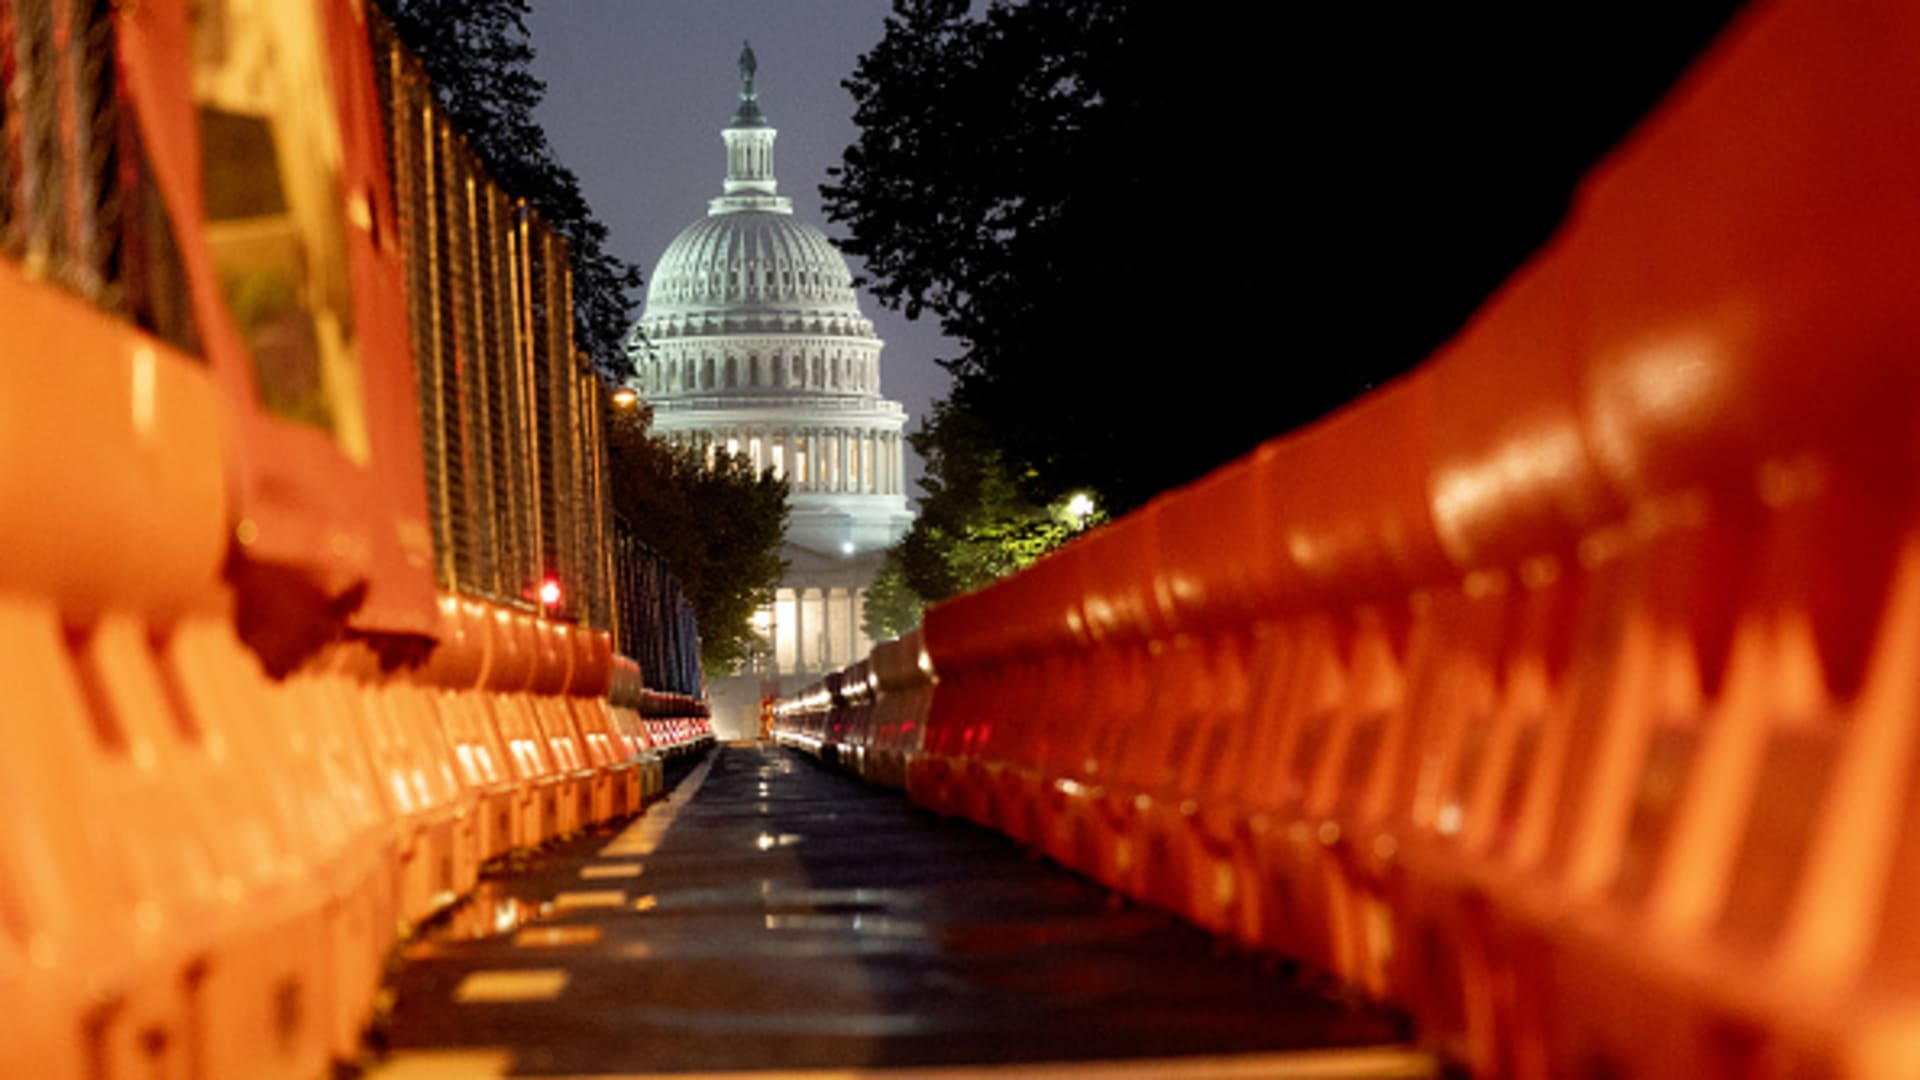 The U.S. Capitol in Washington, D.C., U.S., on Wednesday, Oct. 6, 2021.